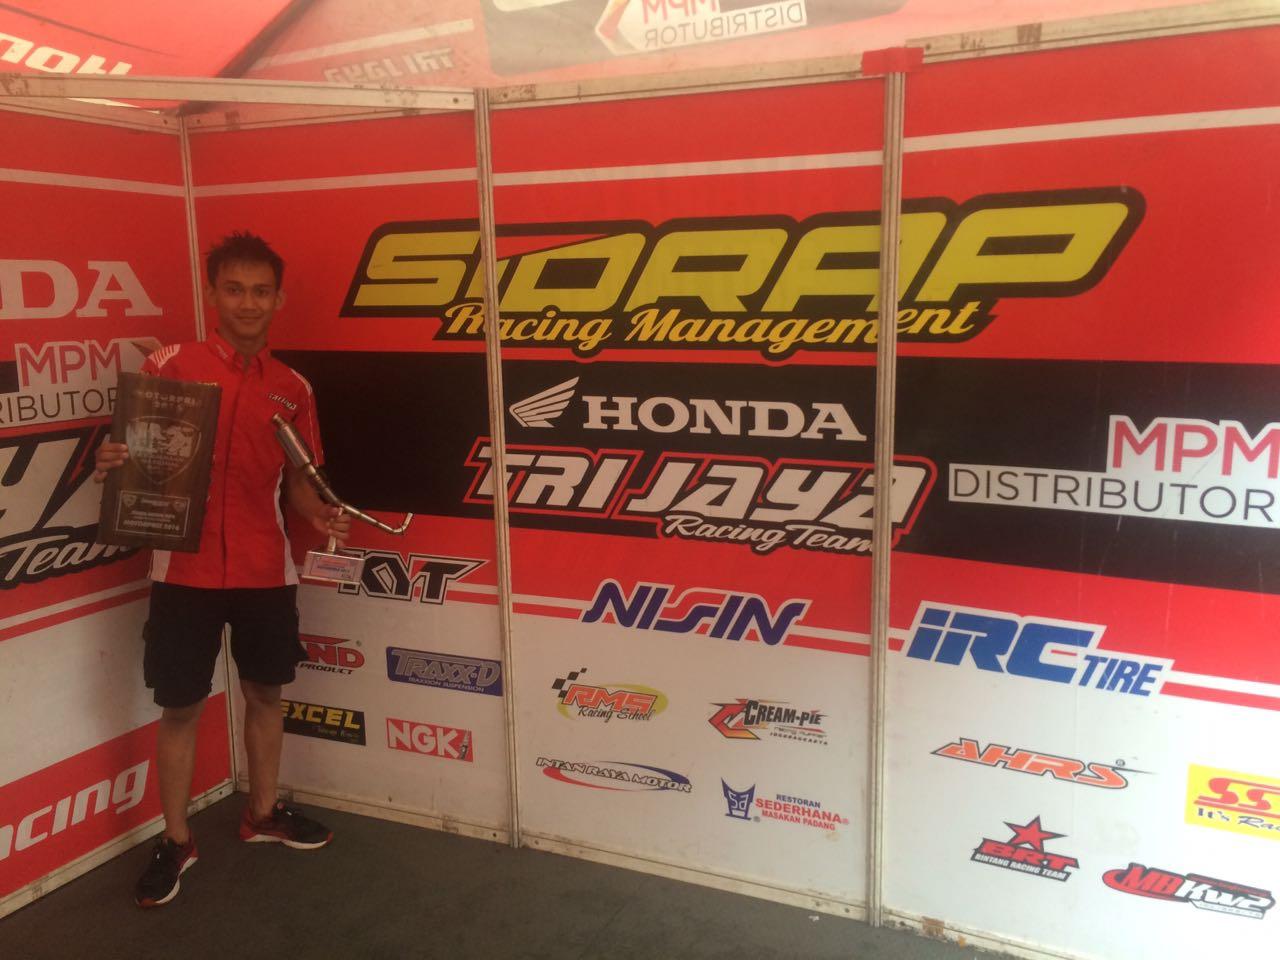 Awhin Sanjaya juara region MP2